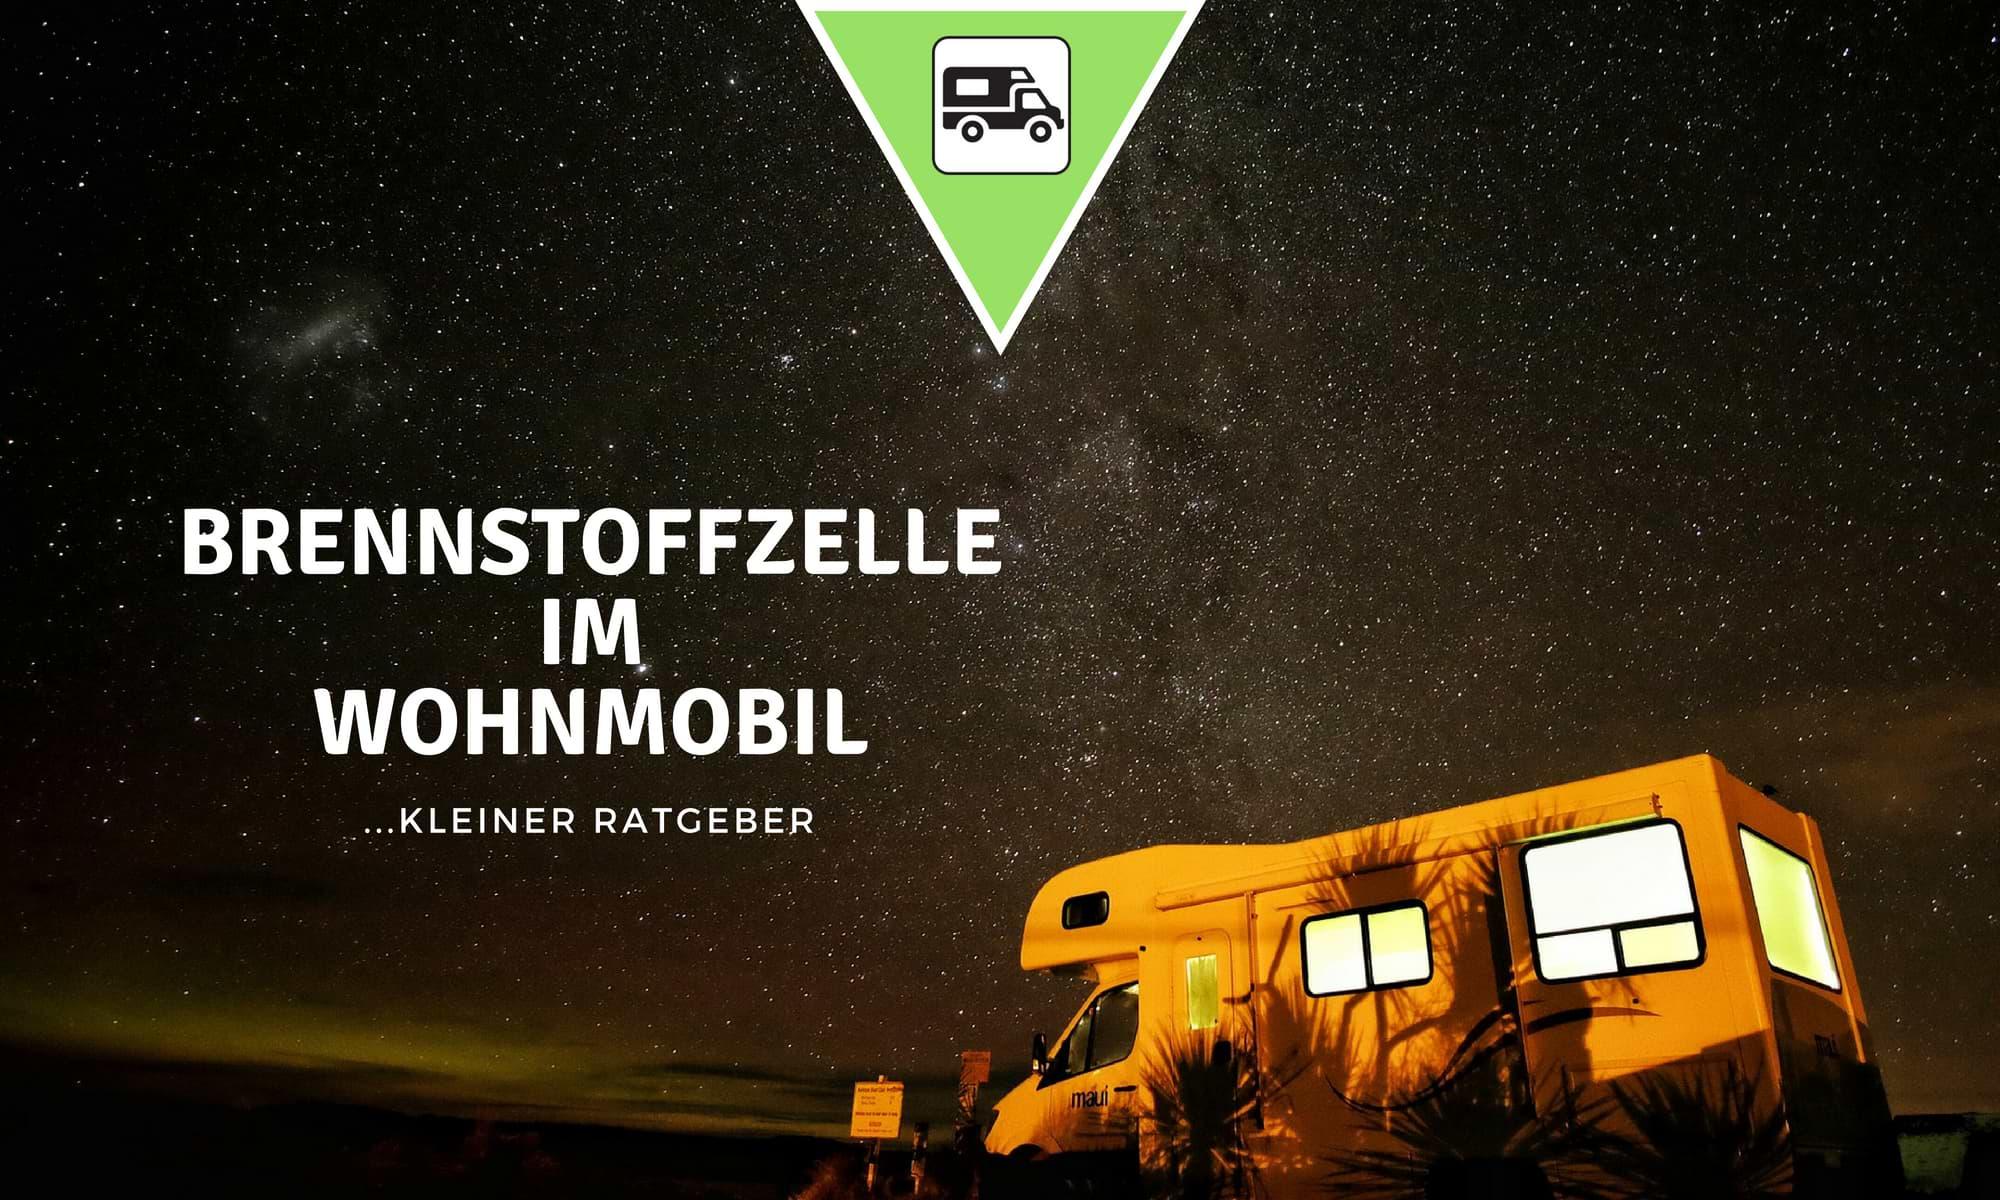 Brennstoffzelle Wohnmobil Ratgeber